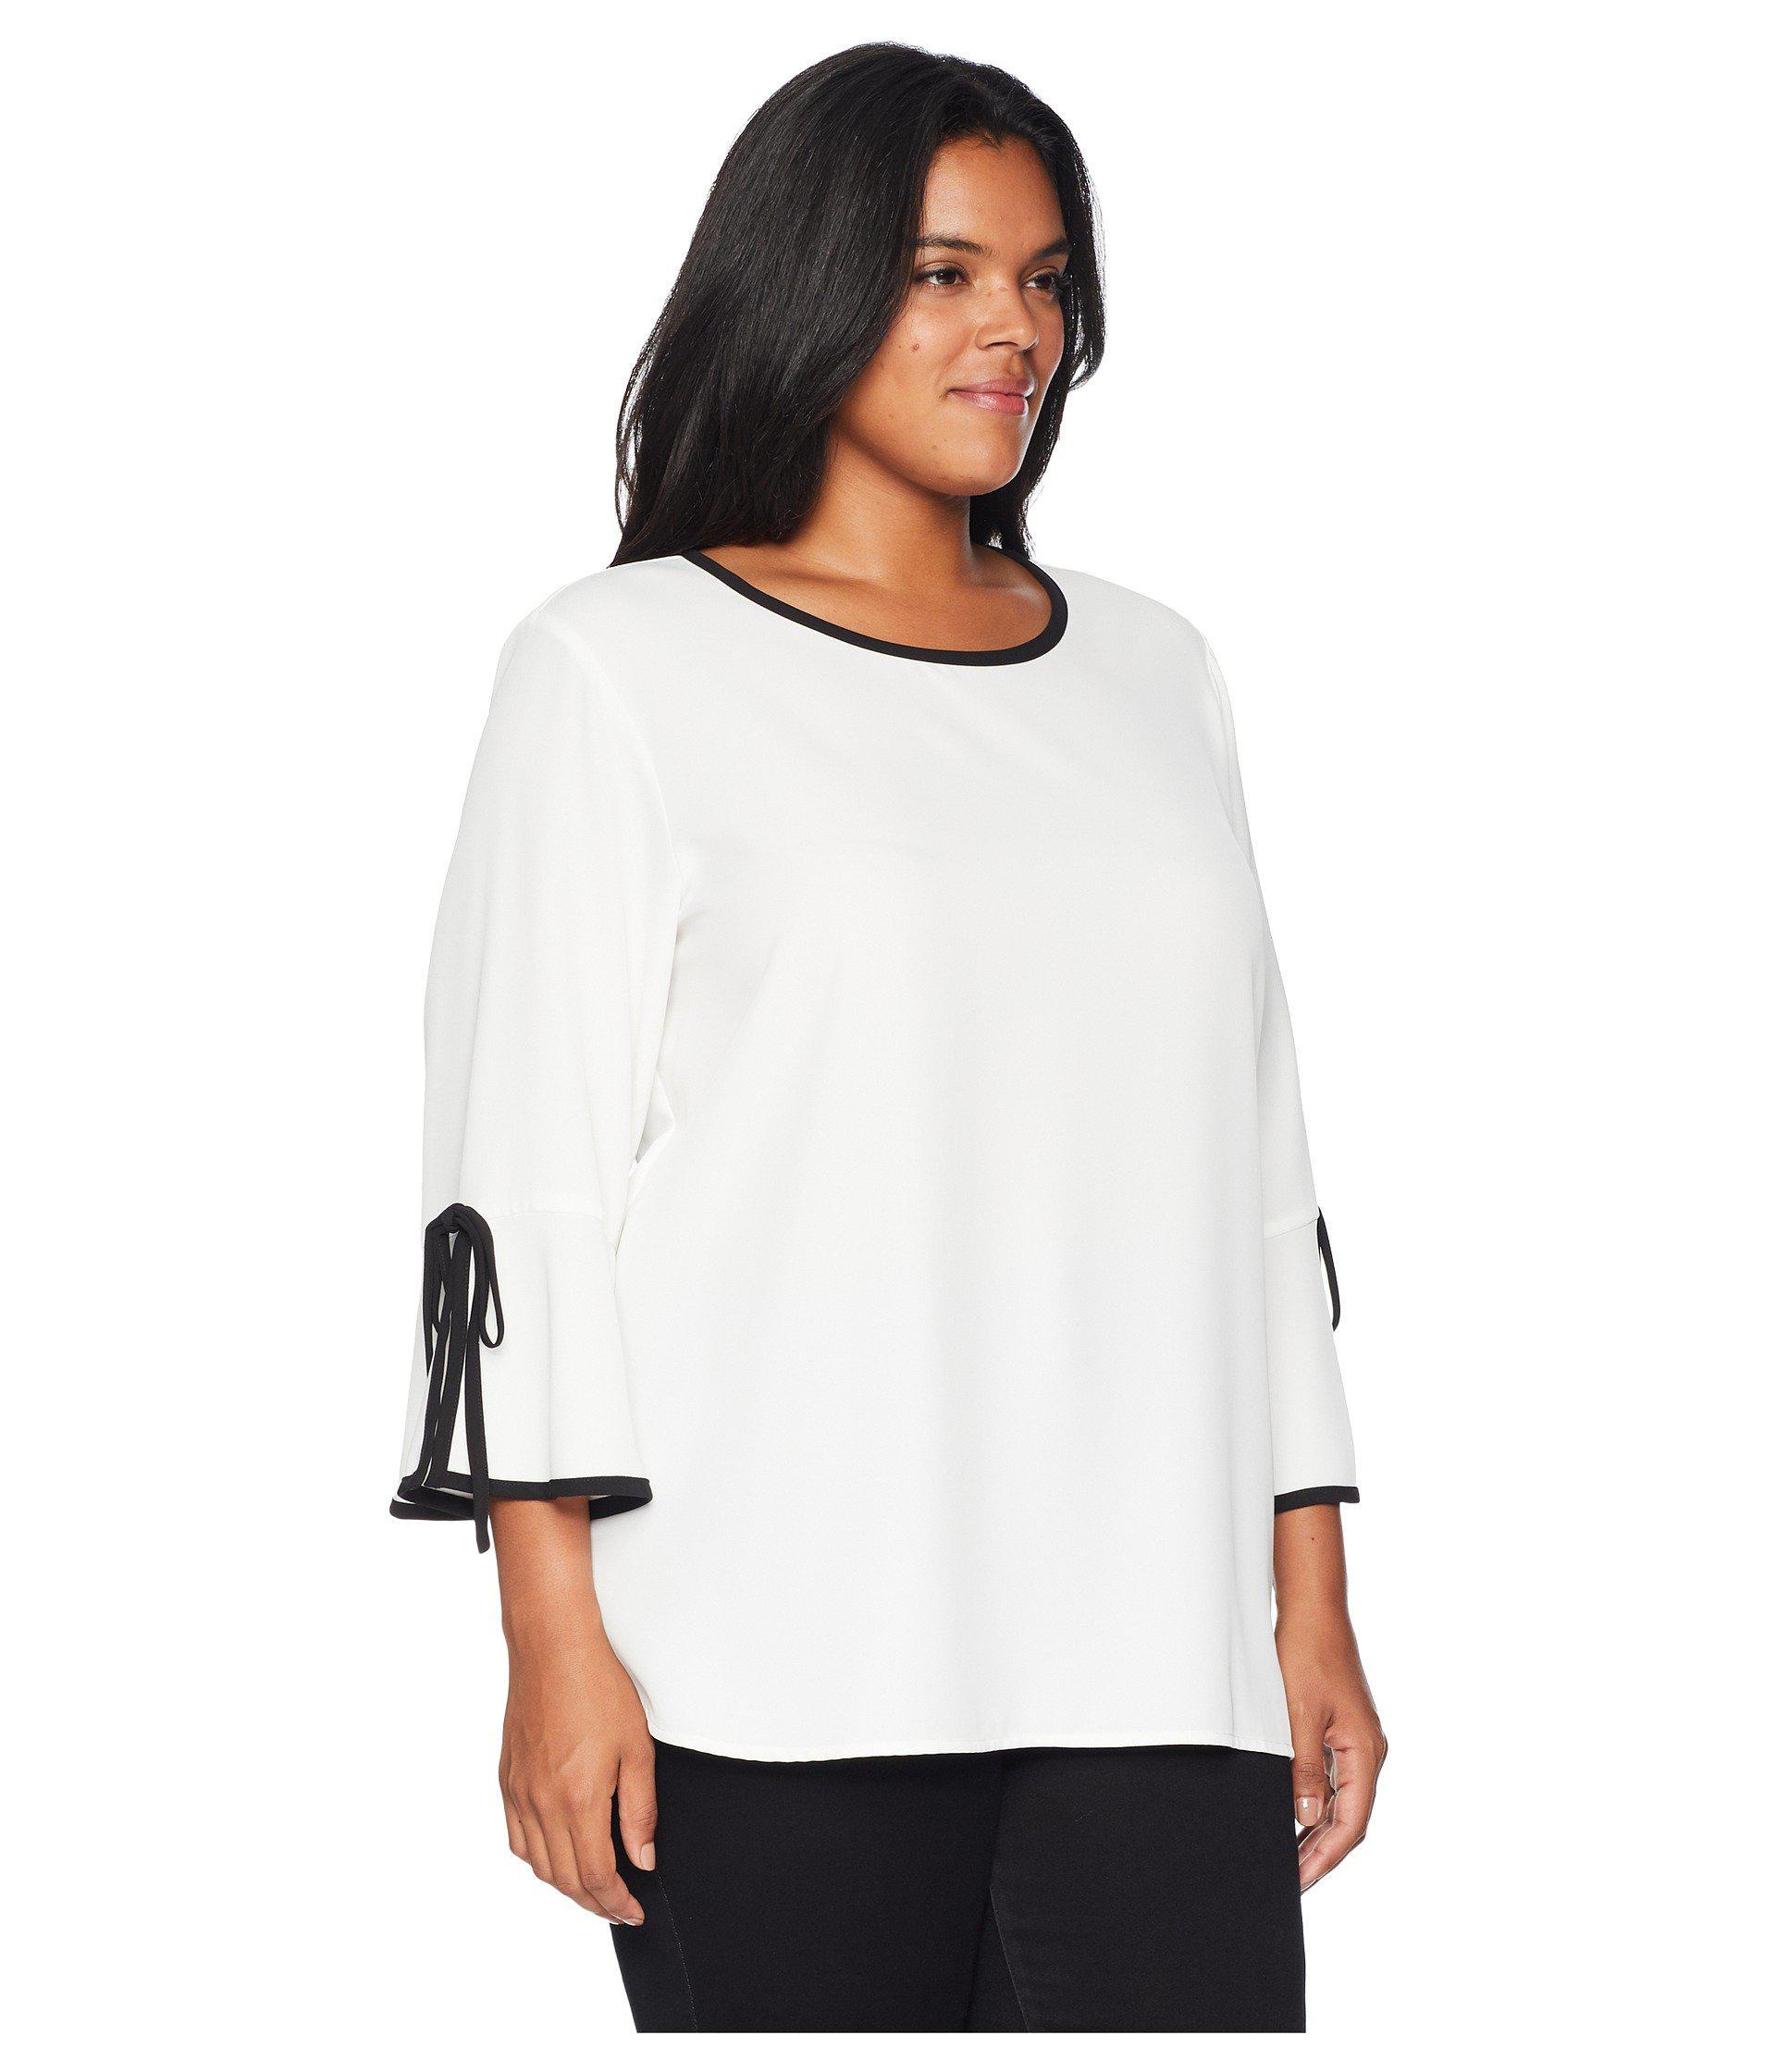 510e25c471e04d Calvin Klein - White Plus Size Long Sleeve Blouse W  Tie Wrist - Lyst. View  fullscreen